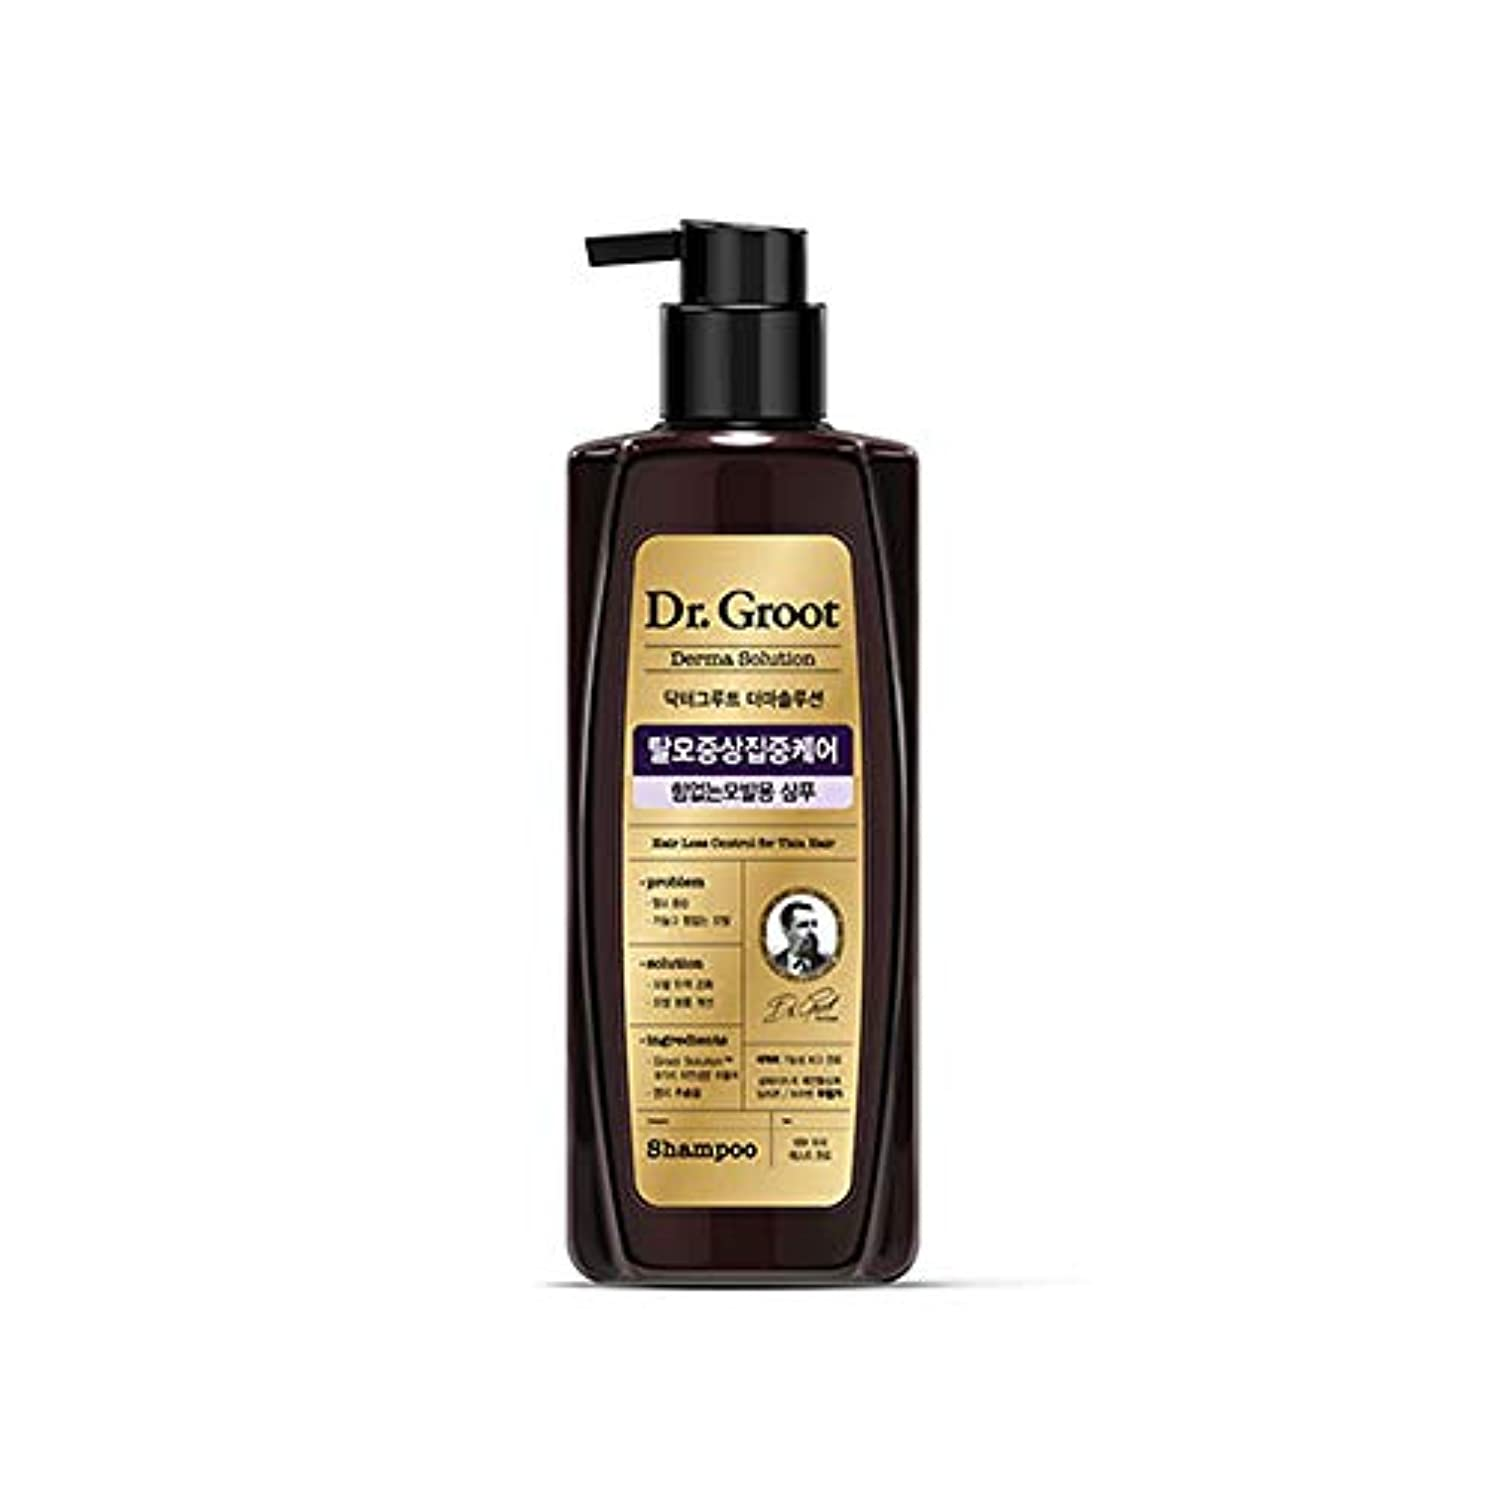 【Dr.Groot】 ドクターグルート Dr.グルート 脱毛防止シャンプー 弱い髪質用(Anti Hair Loss Shampoo -For weak hair-)